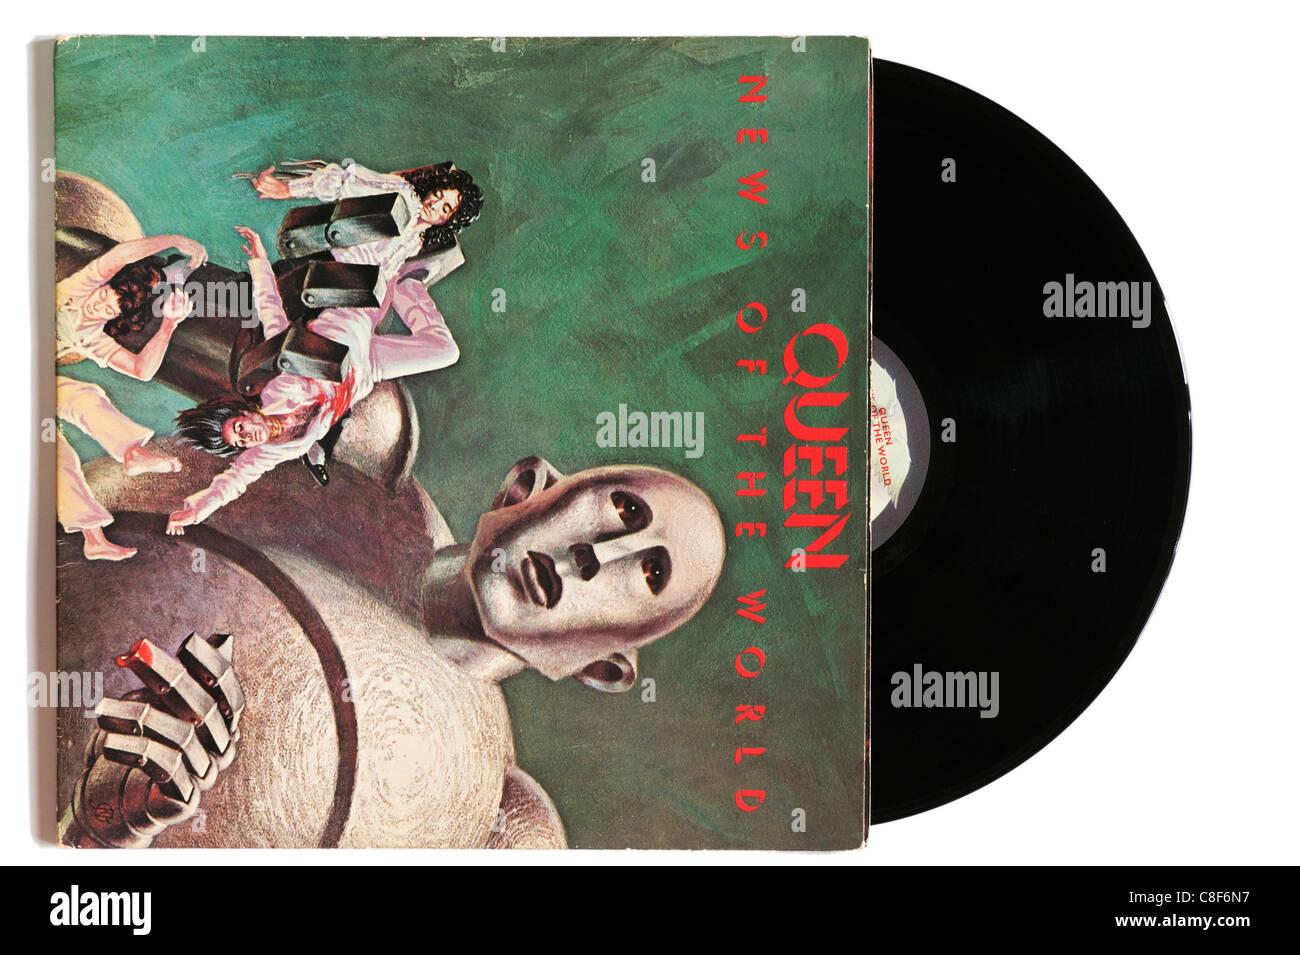 Queen News of the World album - Stock Image